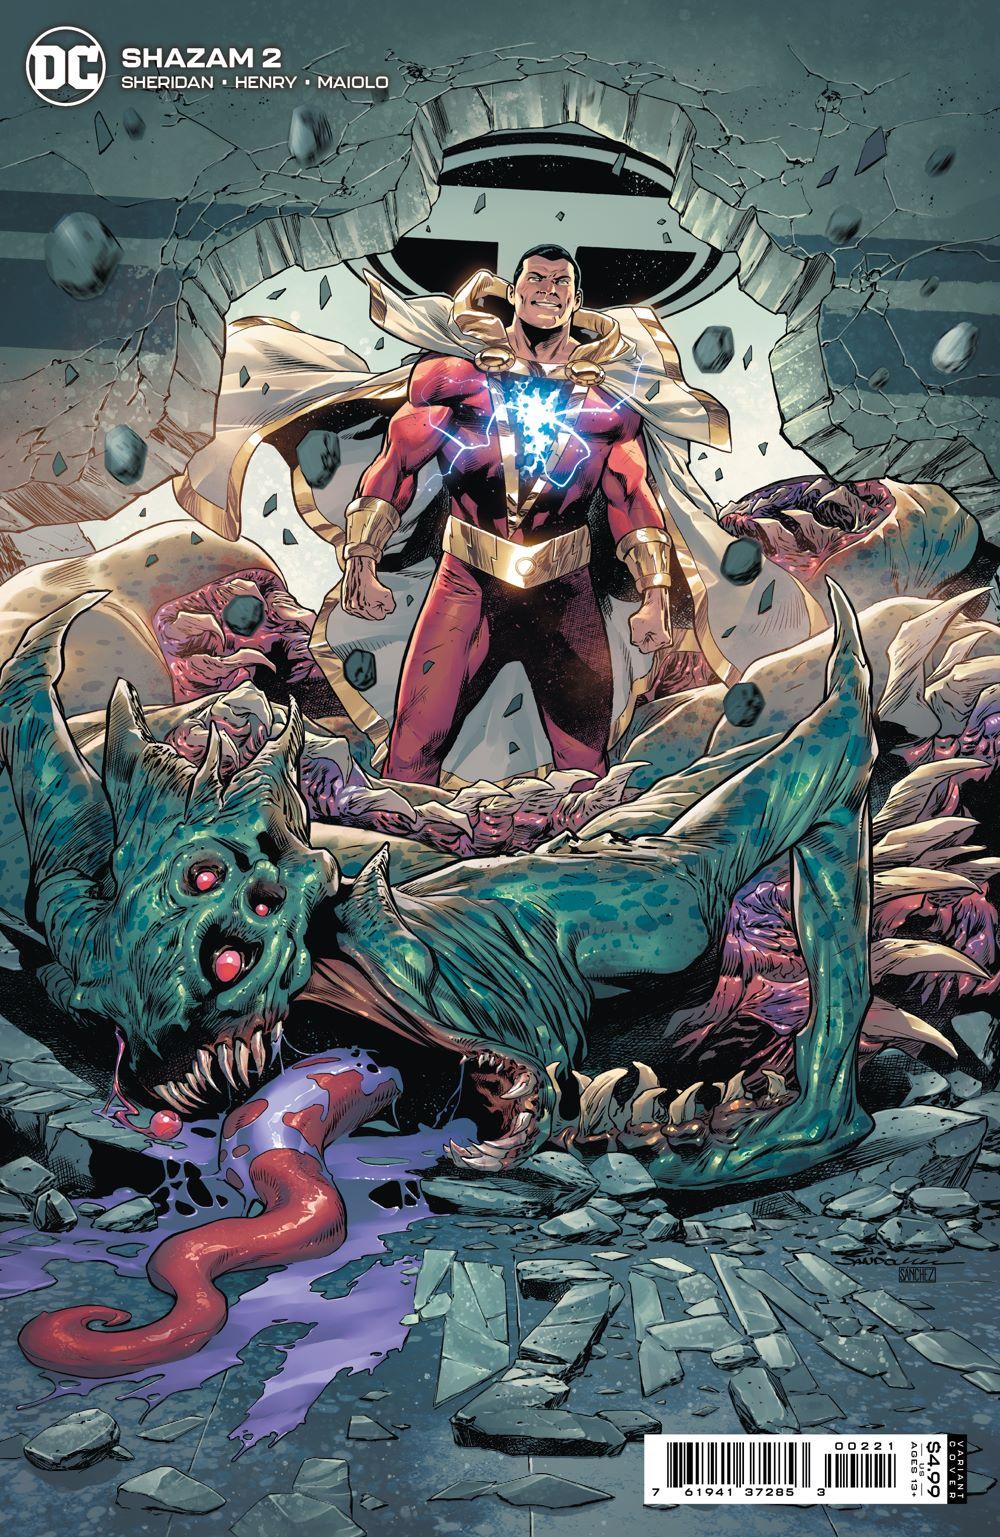 SHAZAM_Cv2_var_00221 DC Comics August 2021 Solicitations